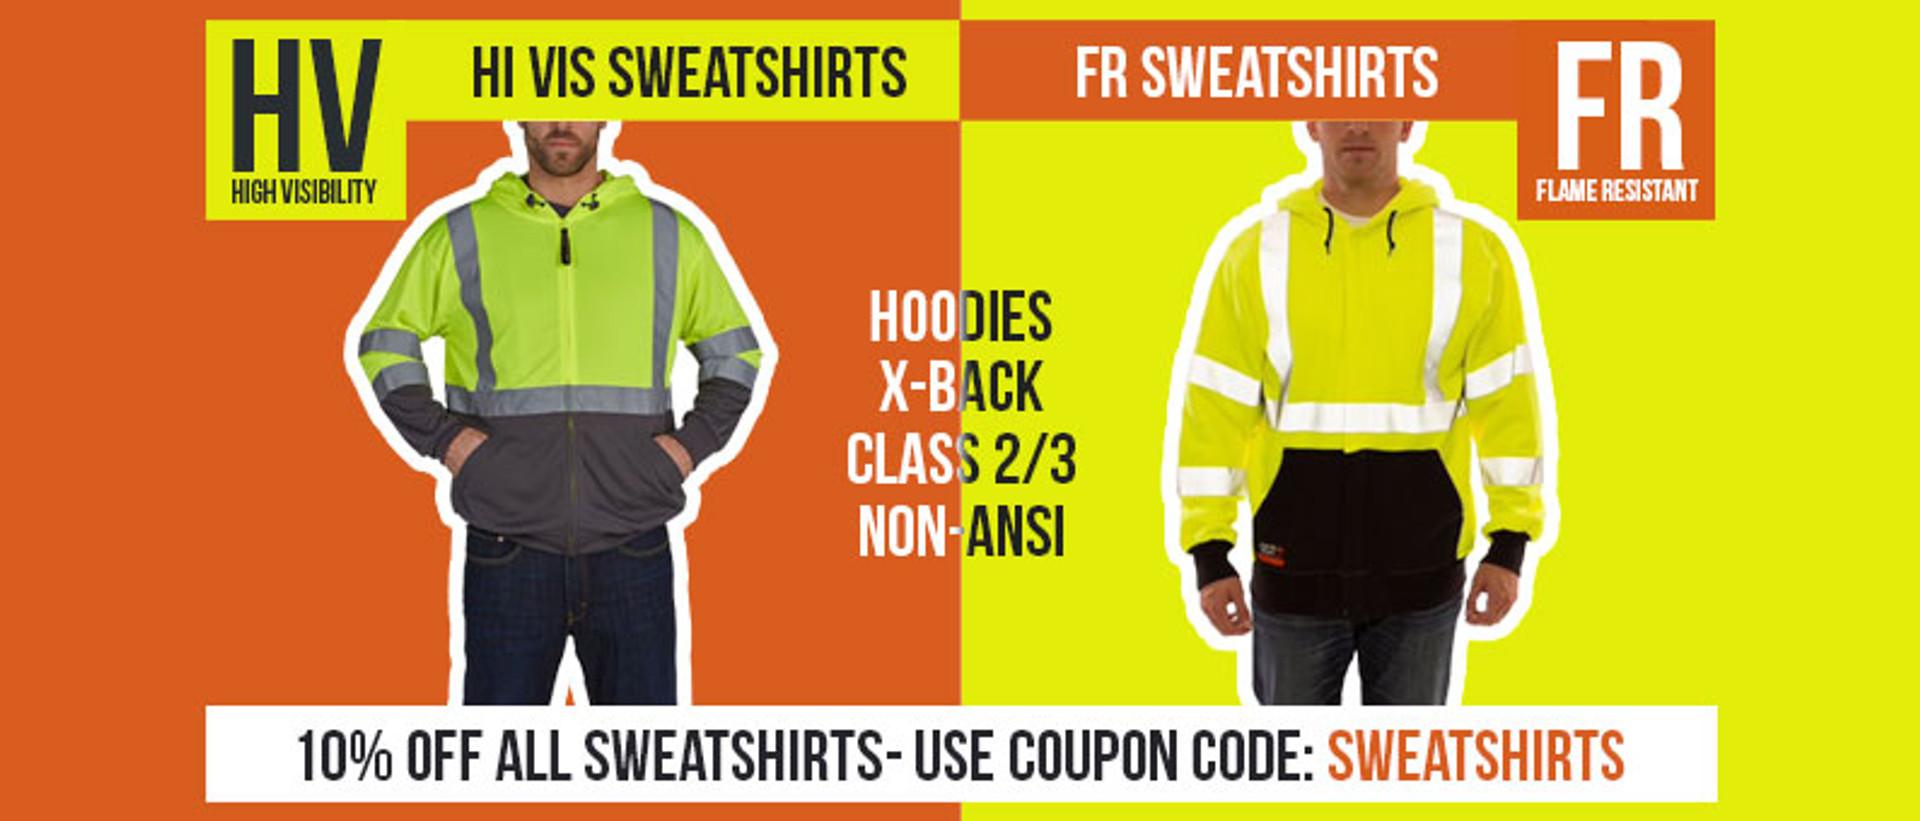 Hi Vis And FR Sweatshirts 10% Off